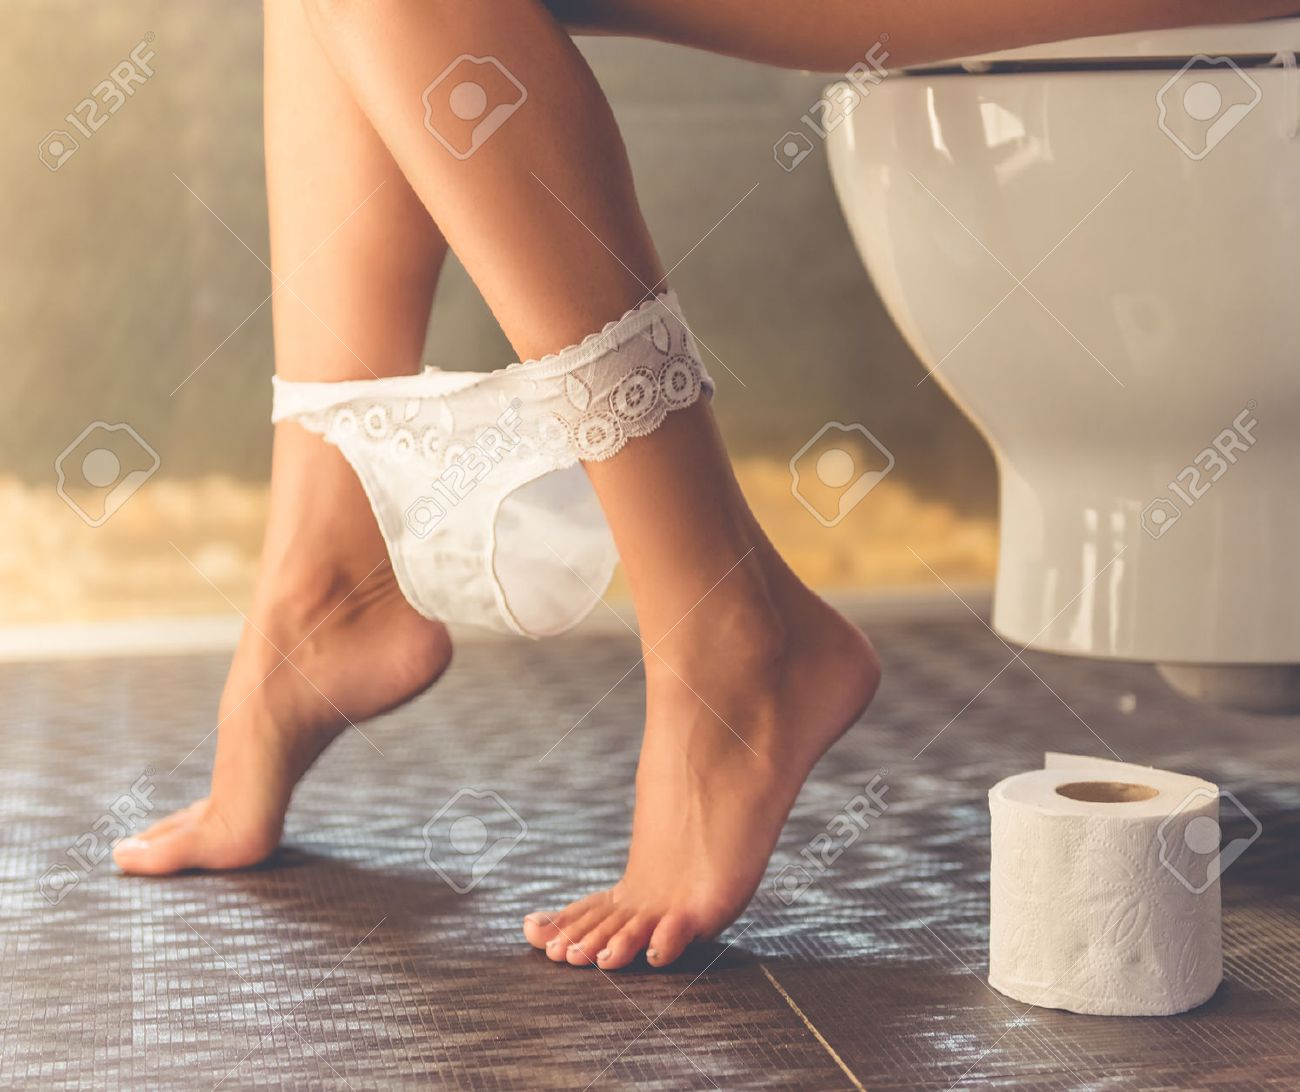 Panties at her ankles